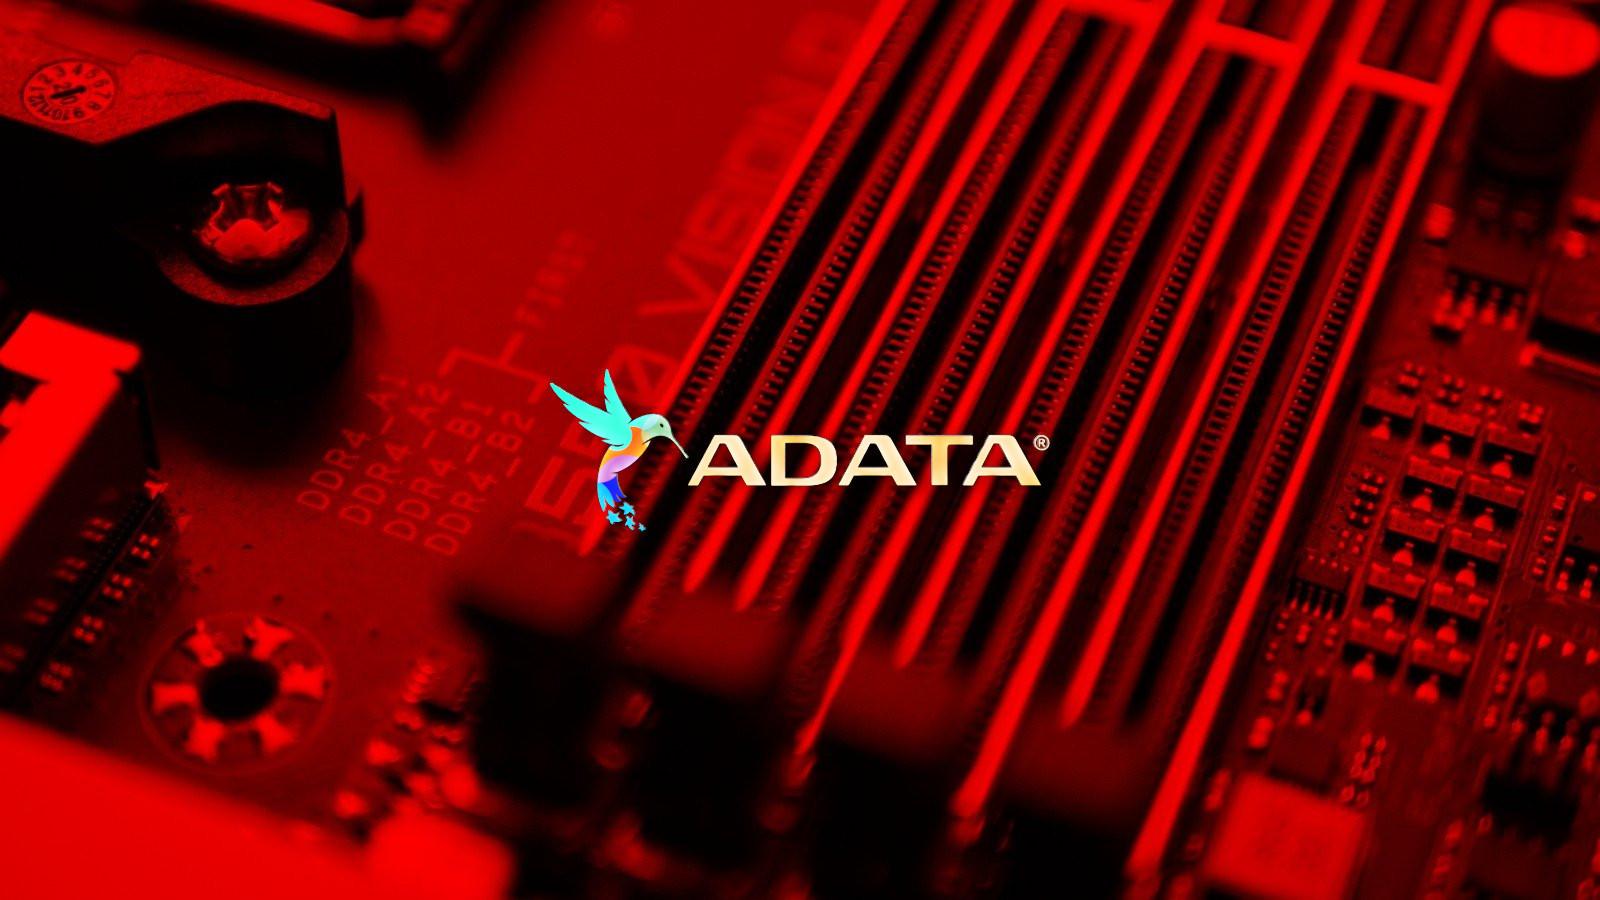 ADATA suffers 700GB data leak in Ragnar Locker ransomware attack